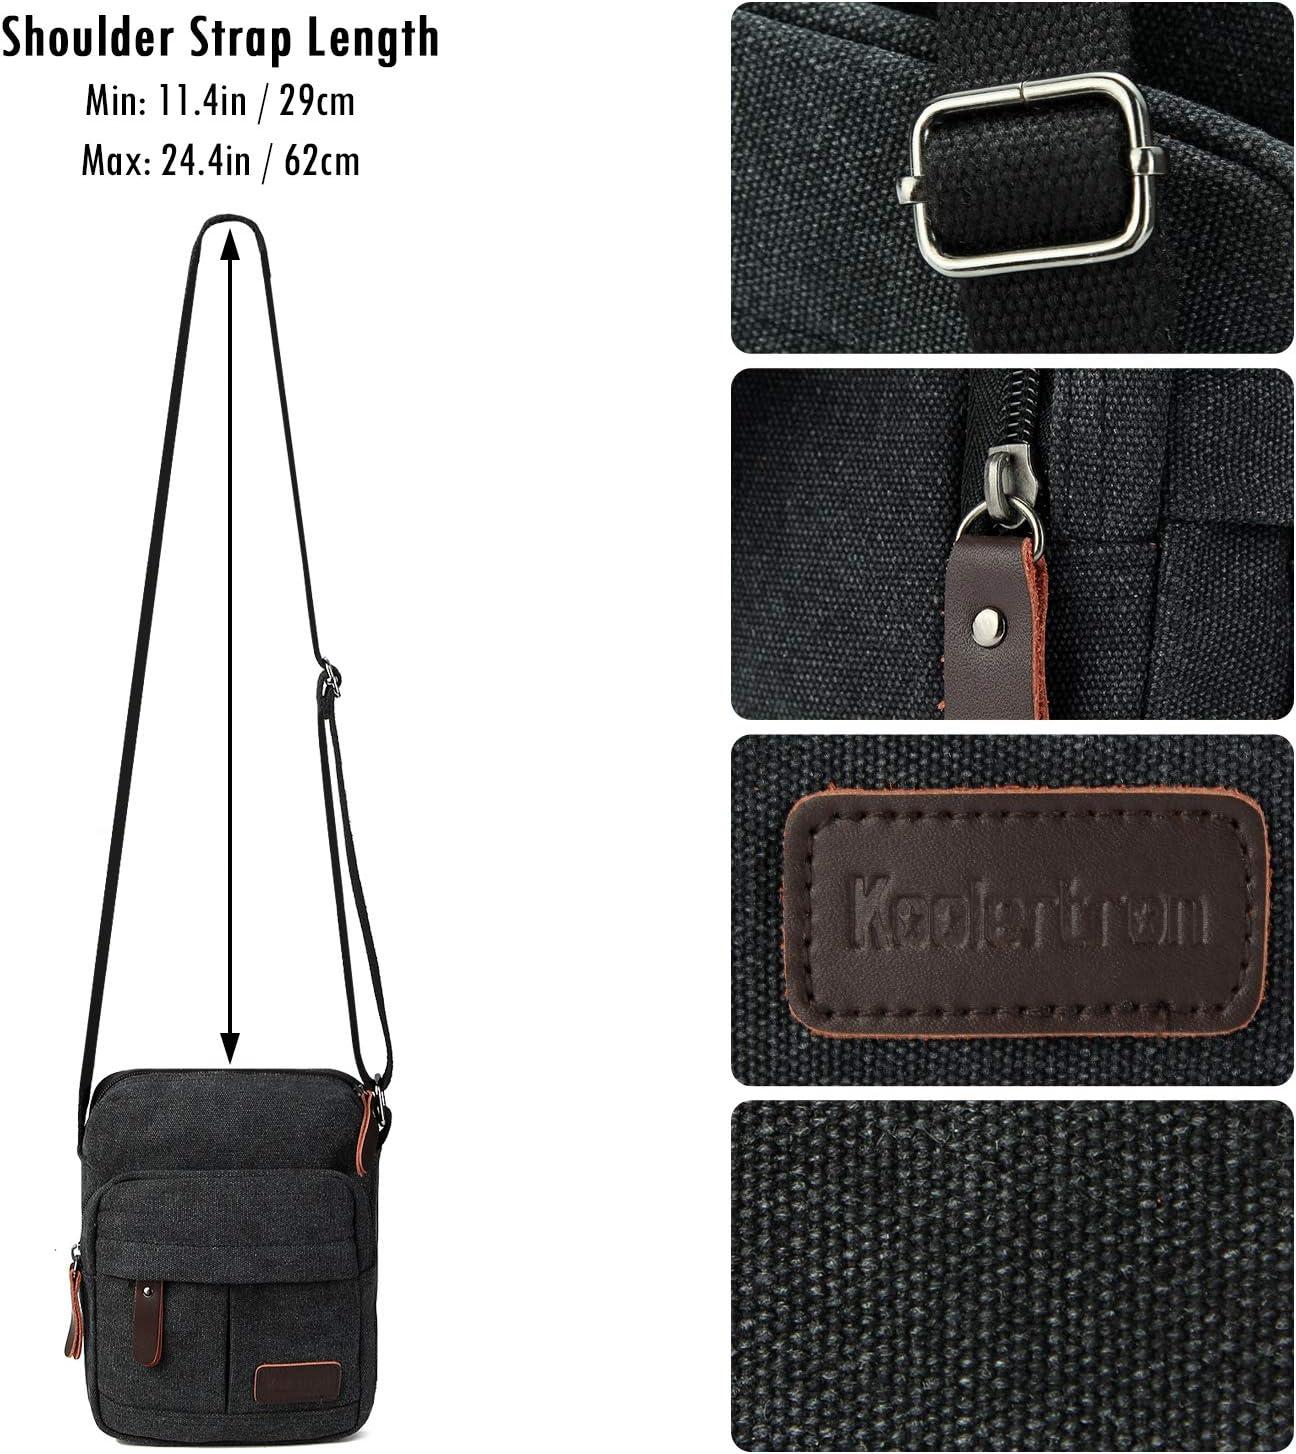 Koolertron Men Shoulder Bag Small Retro Canvas Satchel Zipped Unisex Lightweight Long Strap Crossbody Travel Messenger Bags for Phone iPad Mini Kindle Black, 23x27x11cm//LxHxW